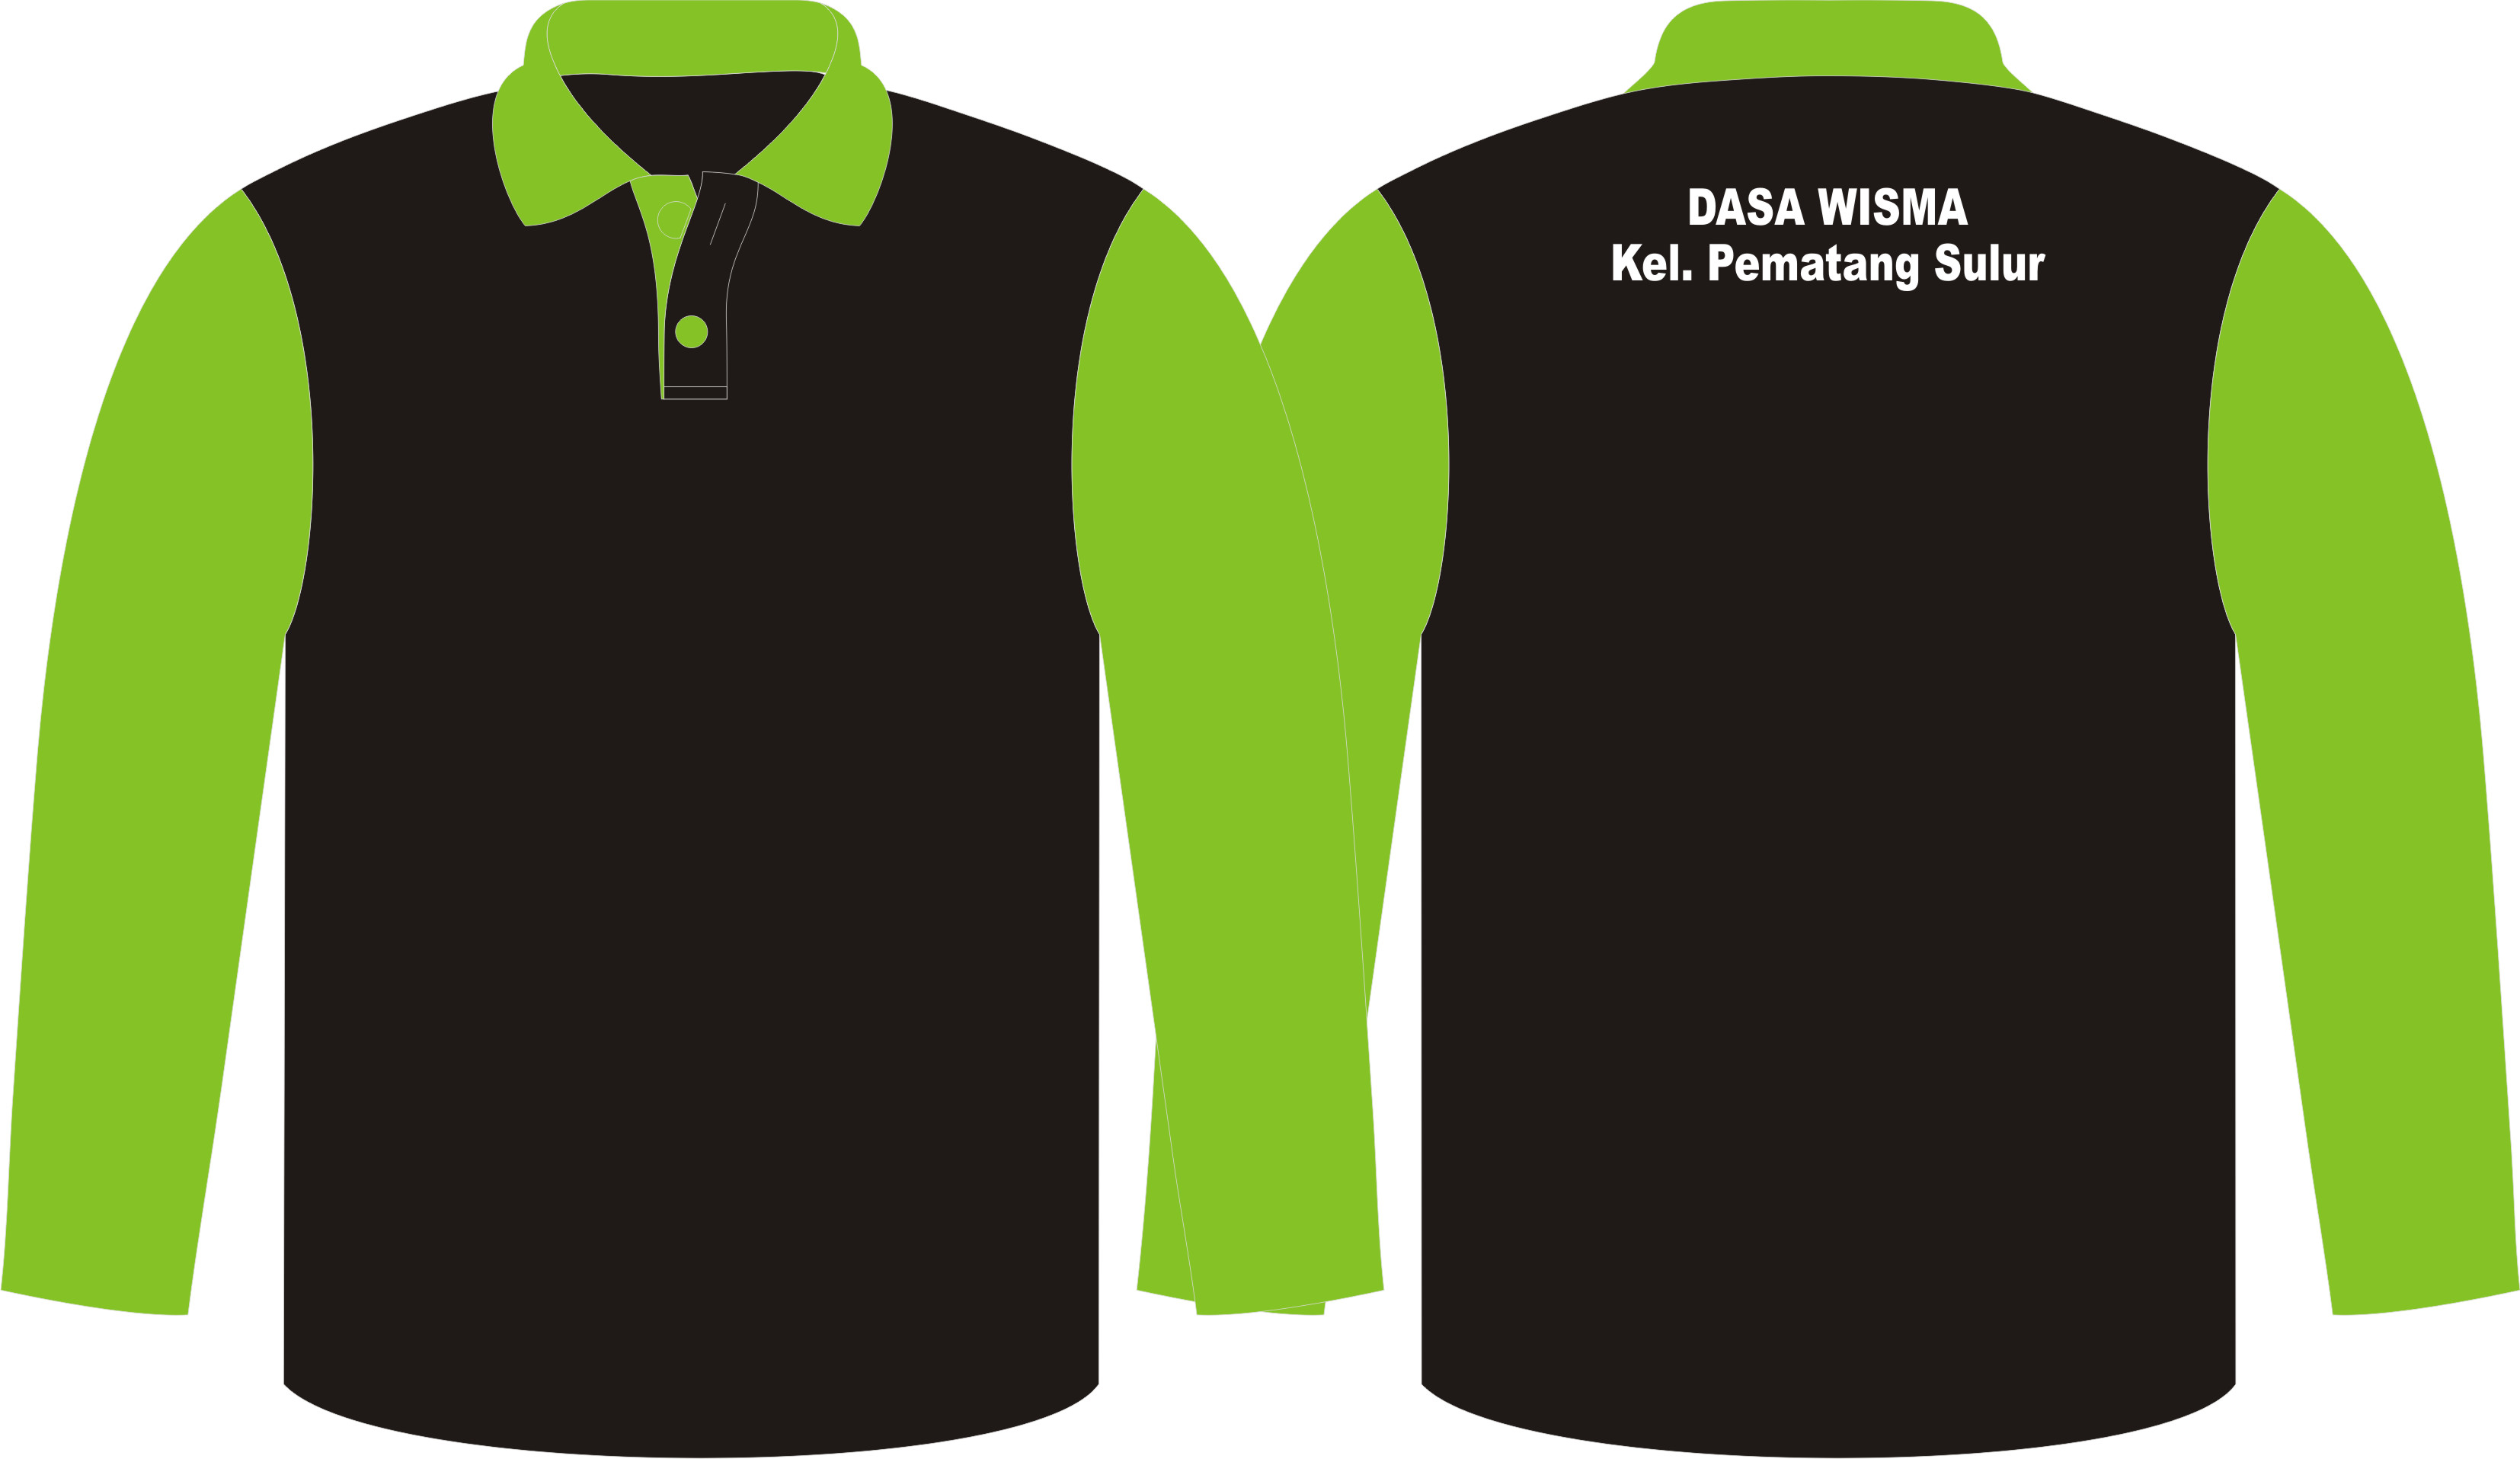 Seragam Dasa Wisma, Poloshirt dan Training